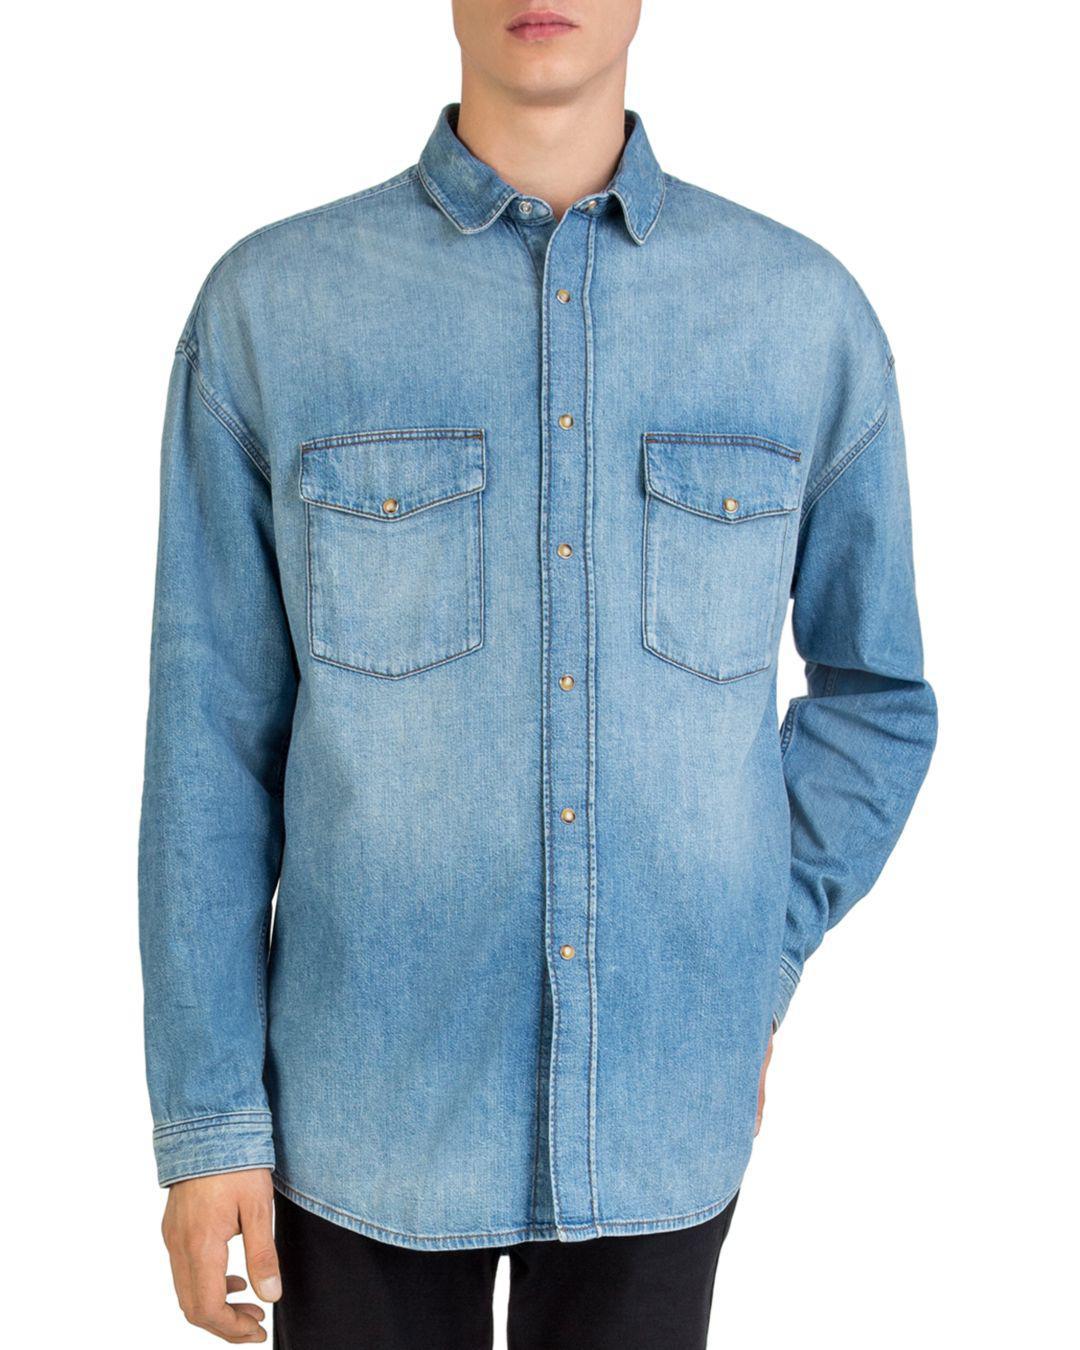 7ebda3e6fc The Kooples - Blue Oversized Faded Denim Shirt for Men - Lyst. View  fullscreen